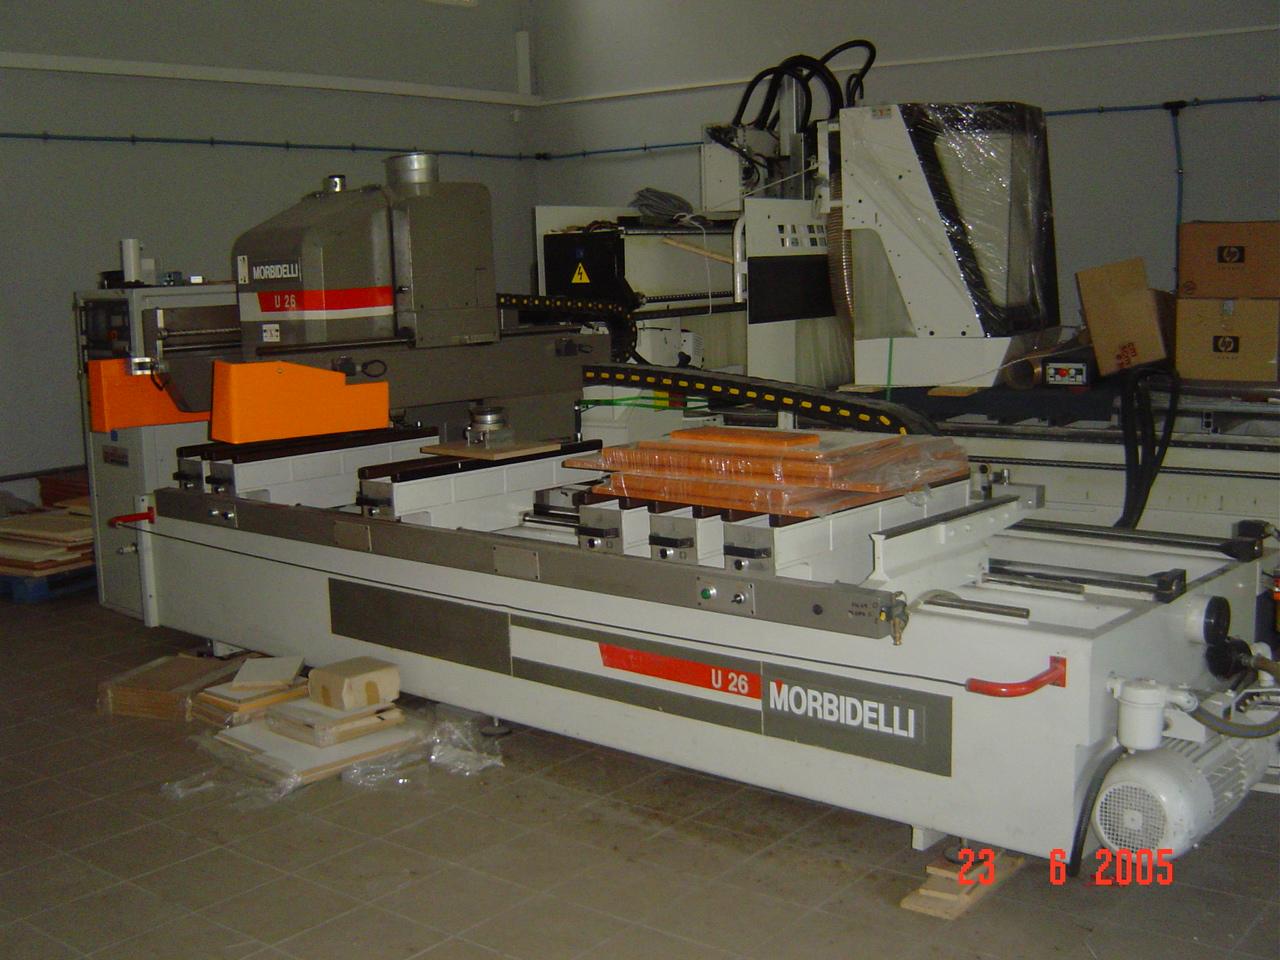 CNC MORBIDELLI U26